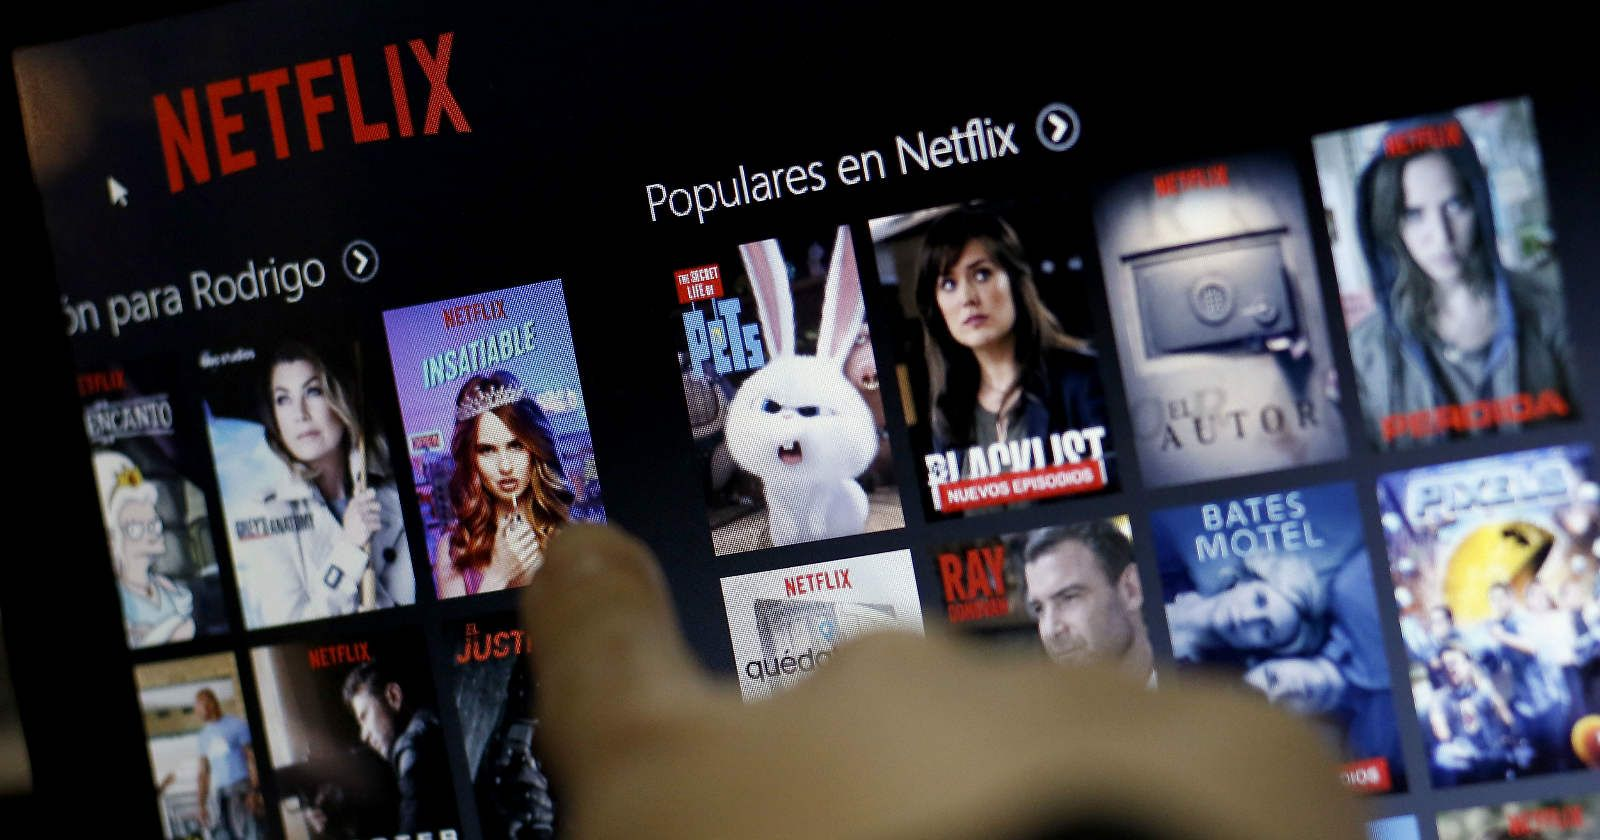 Netflix-elite-riverdale-black-mirror